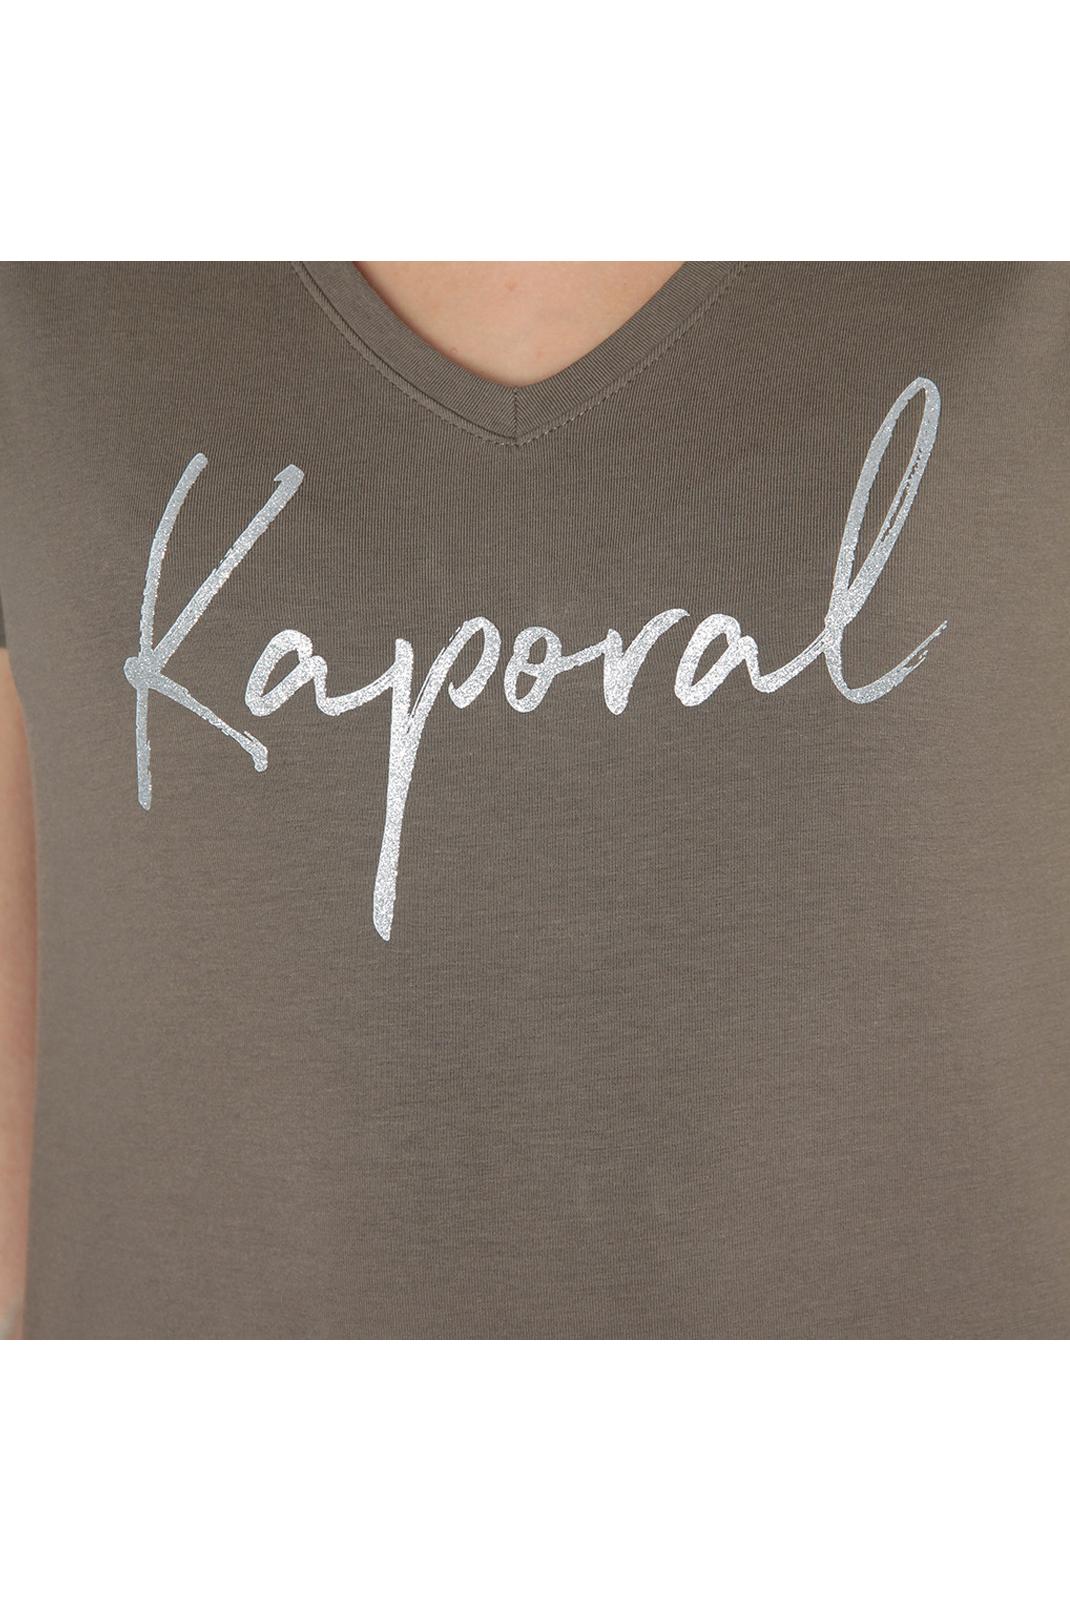 Tee shirt  Kaporal BUXOM TREILLIS